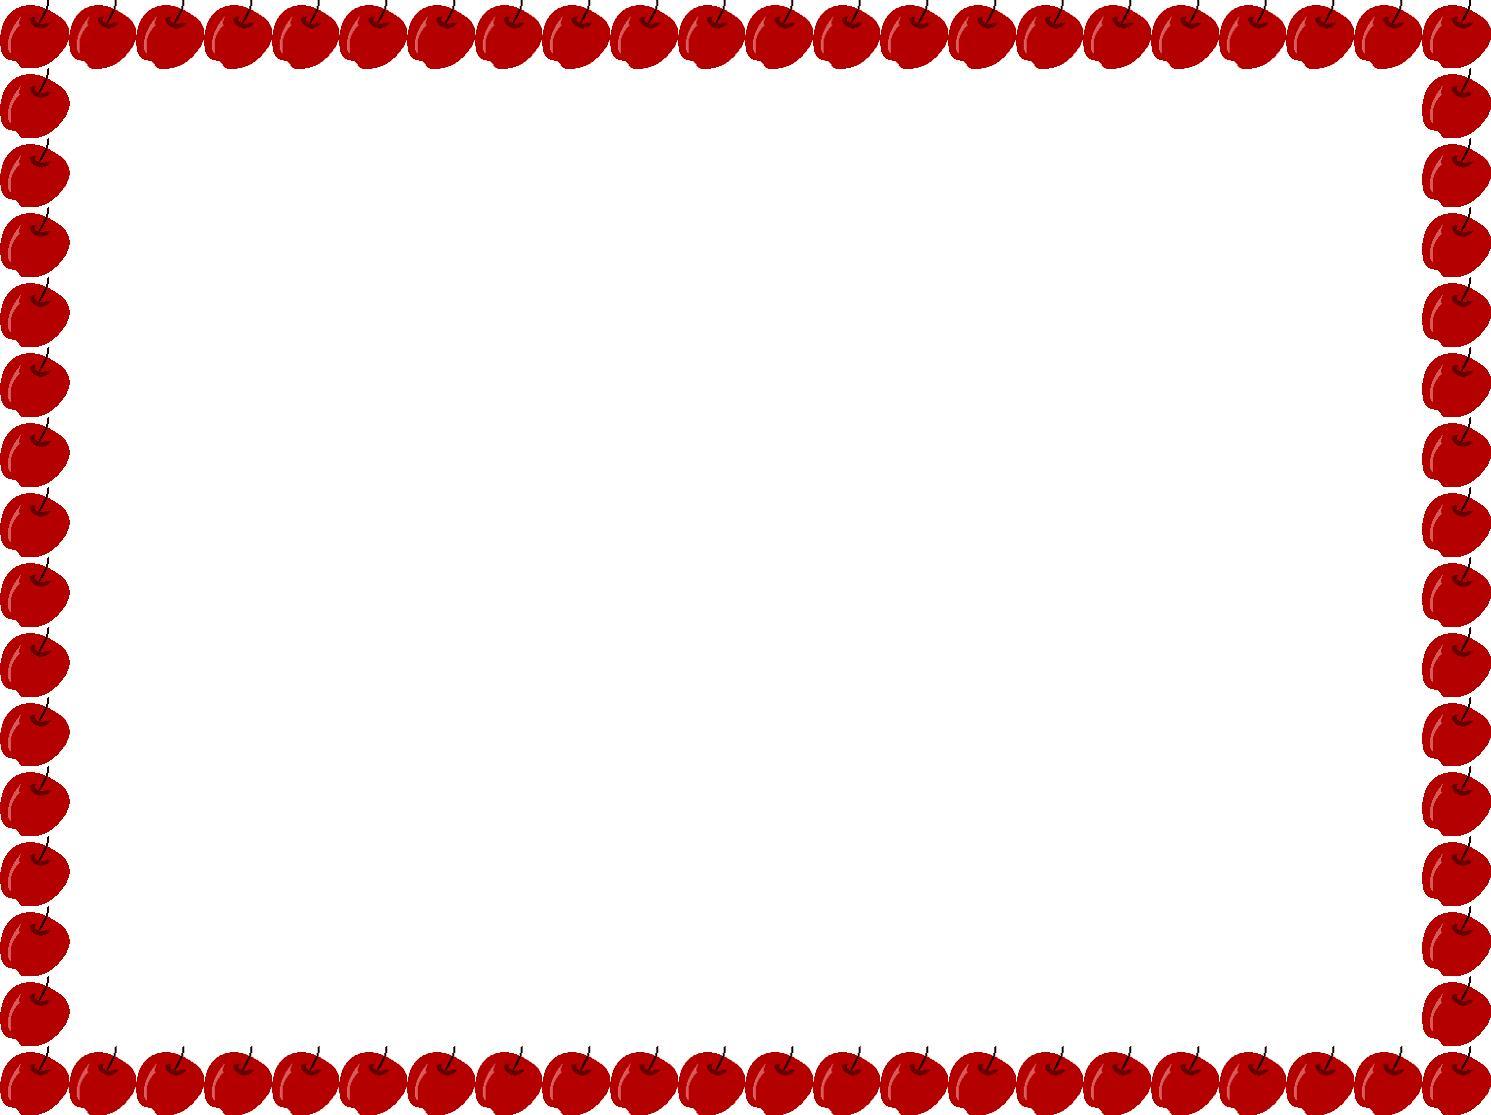 Free Polka Dot Border Clip Art Cliparts -Free Polka Dot Border Clip Art Cliparts Co-9